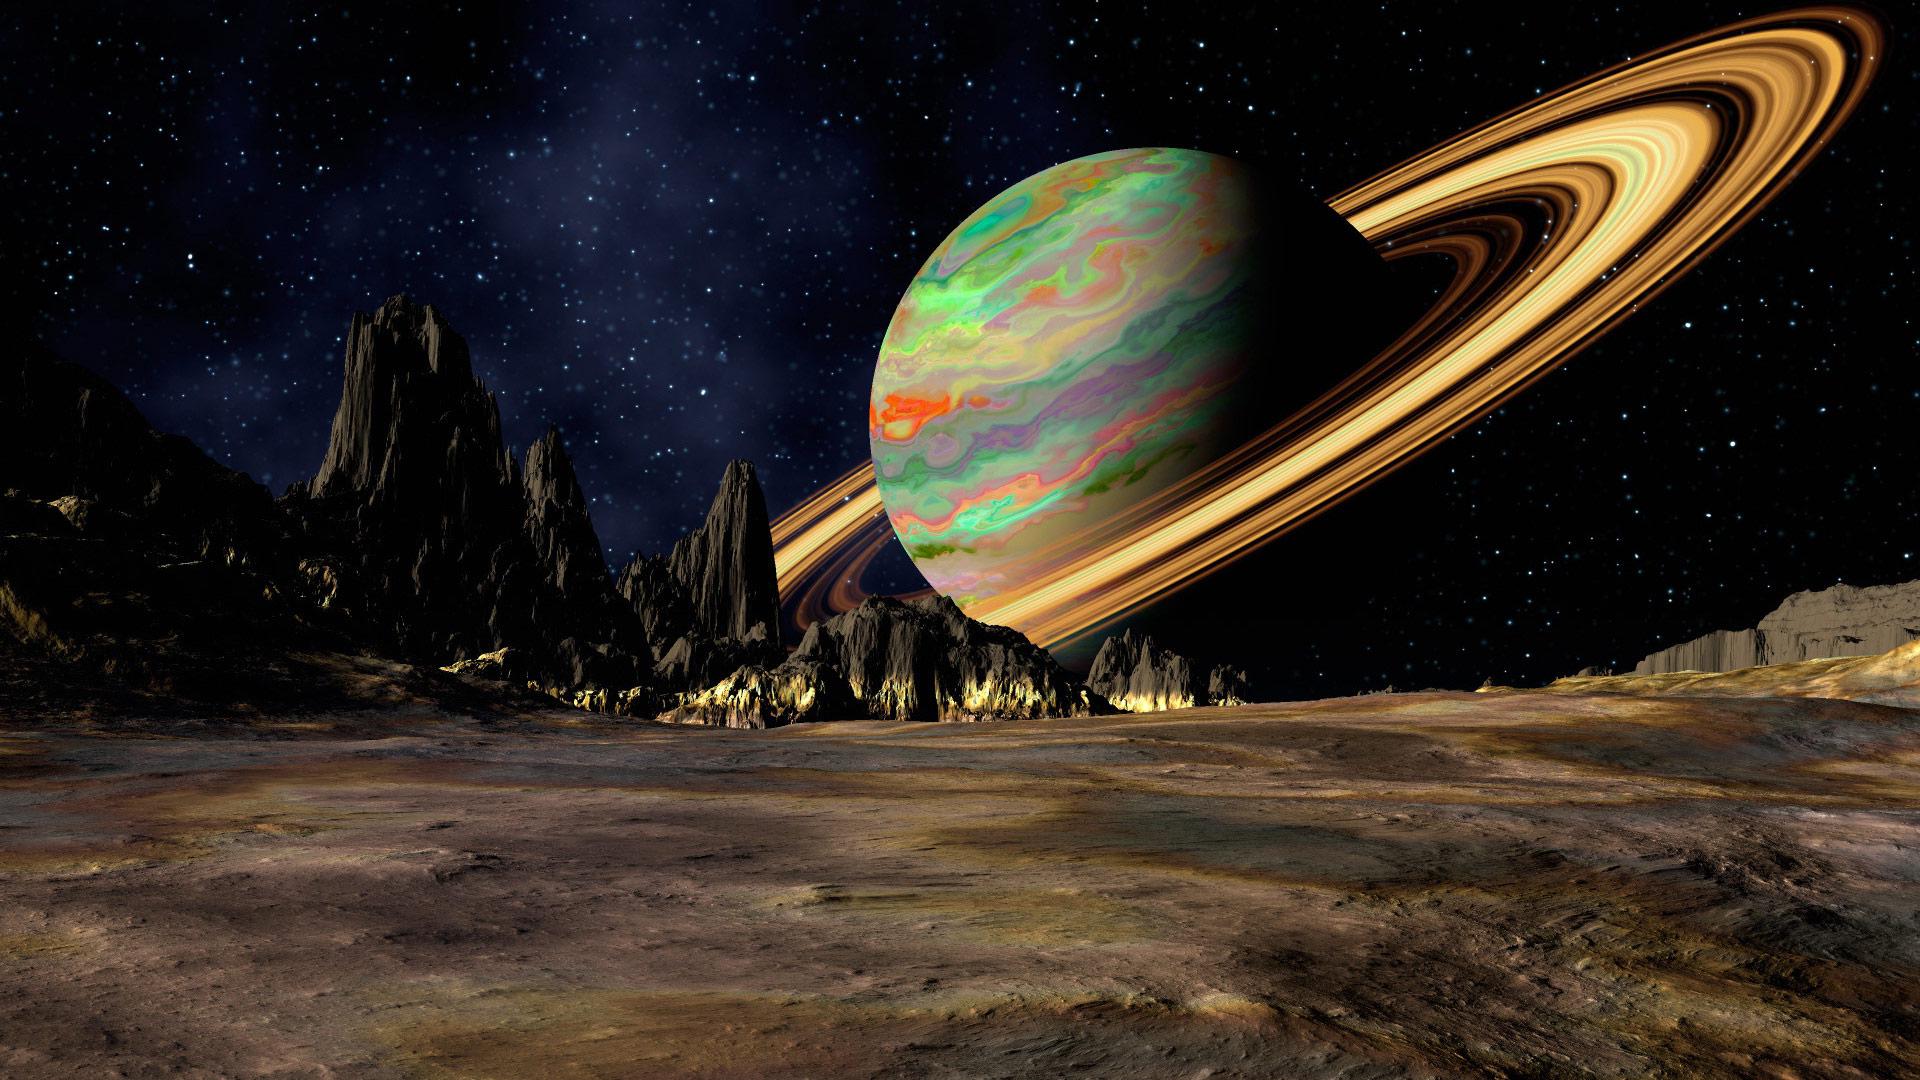 Космические пейзажи фото